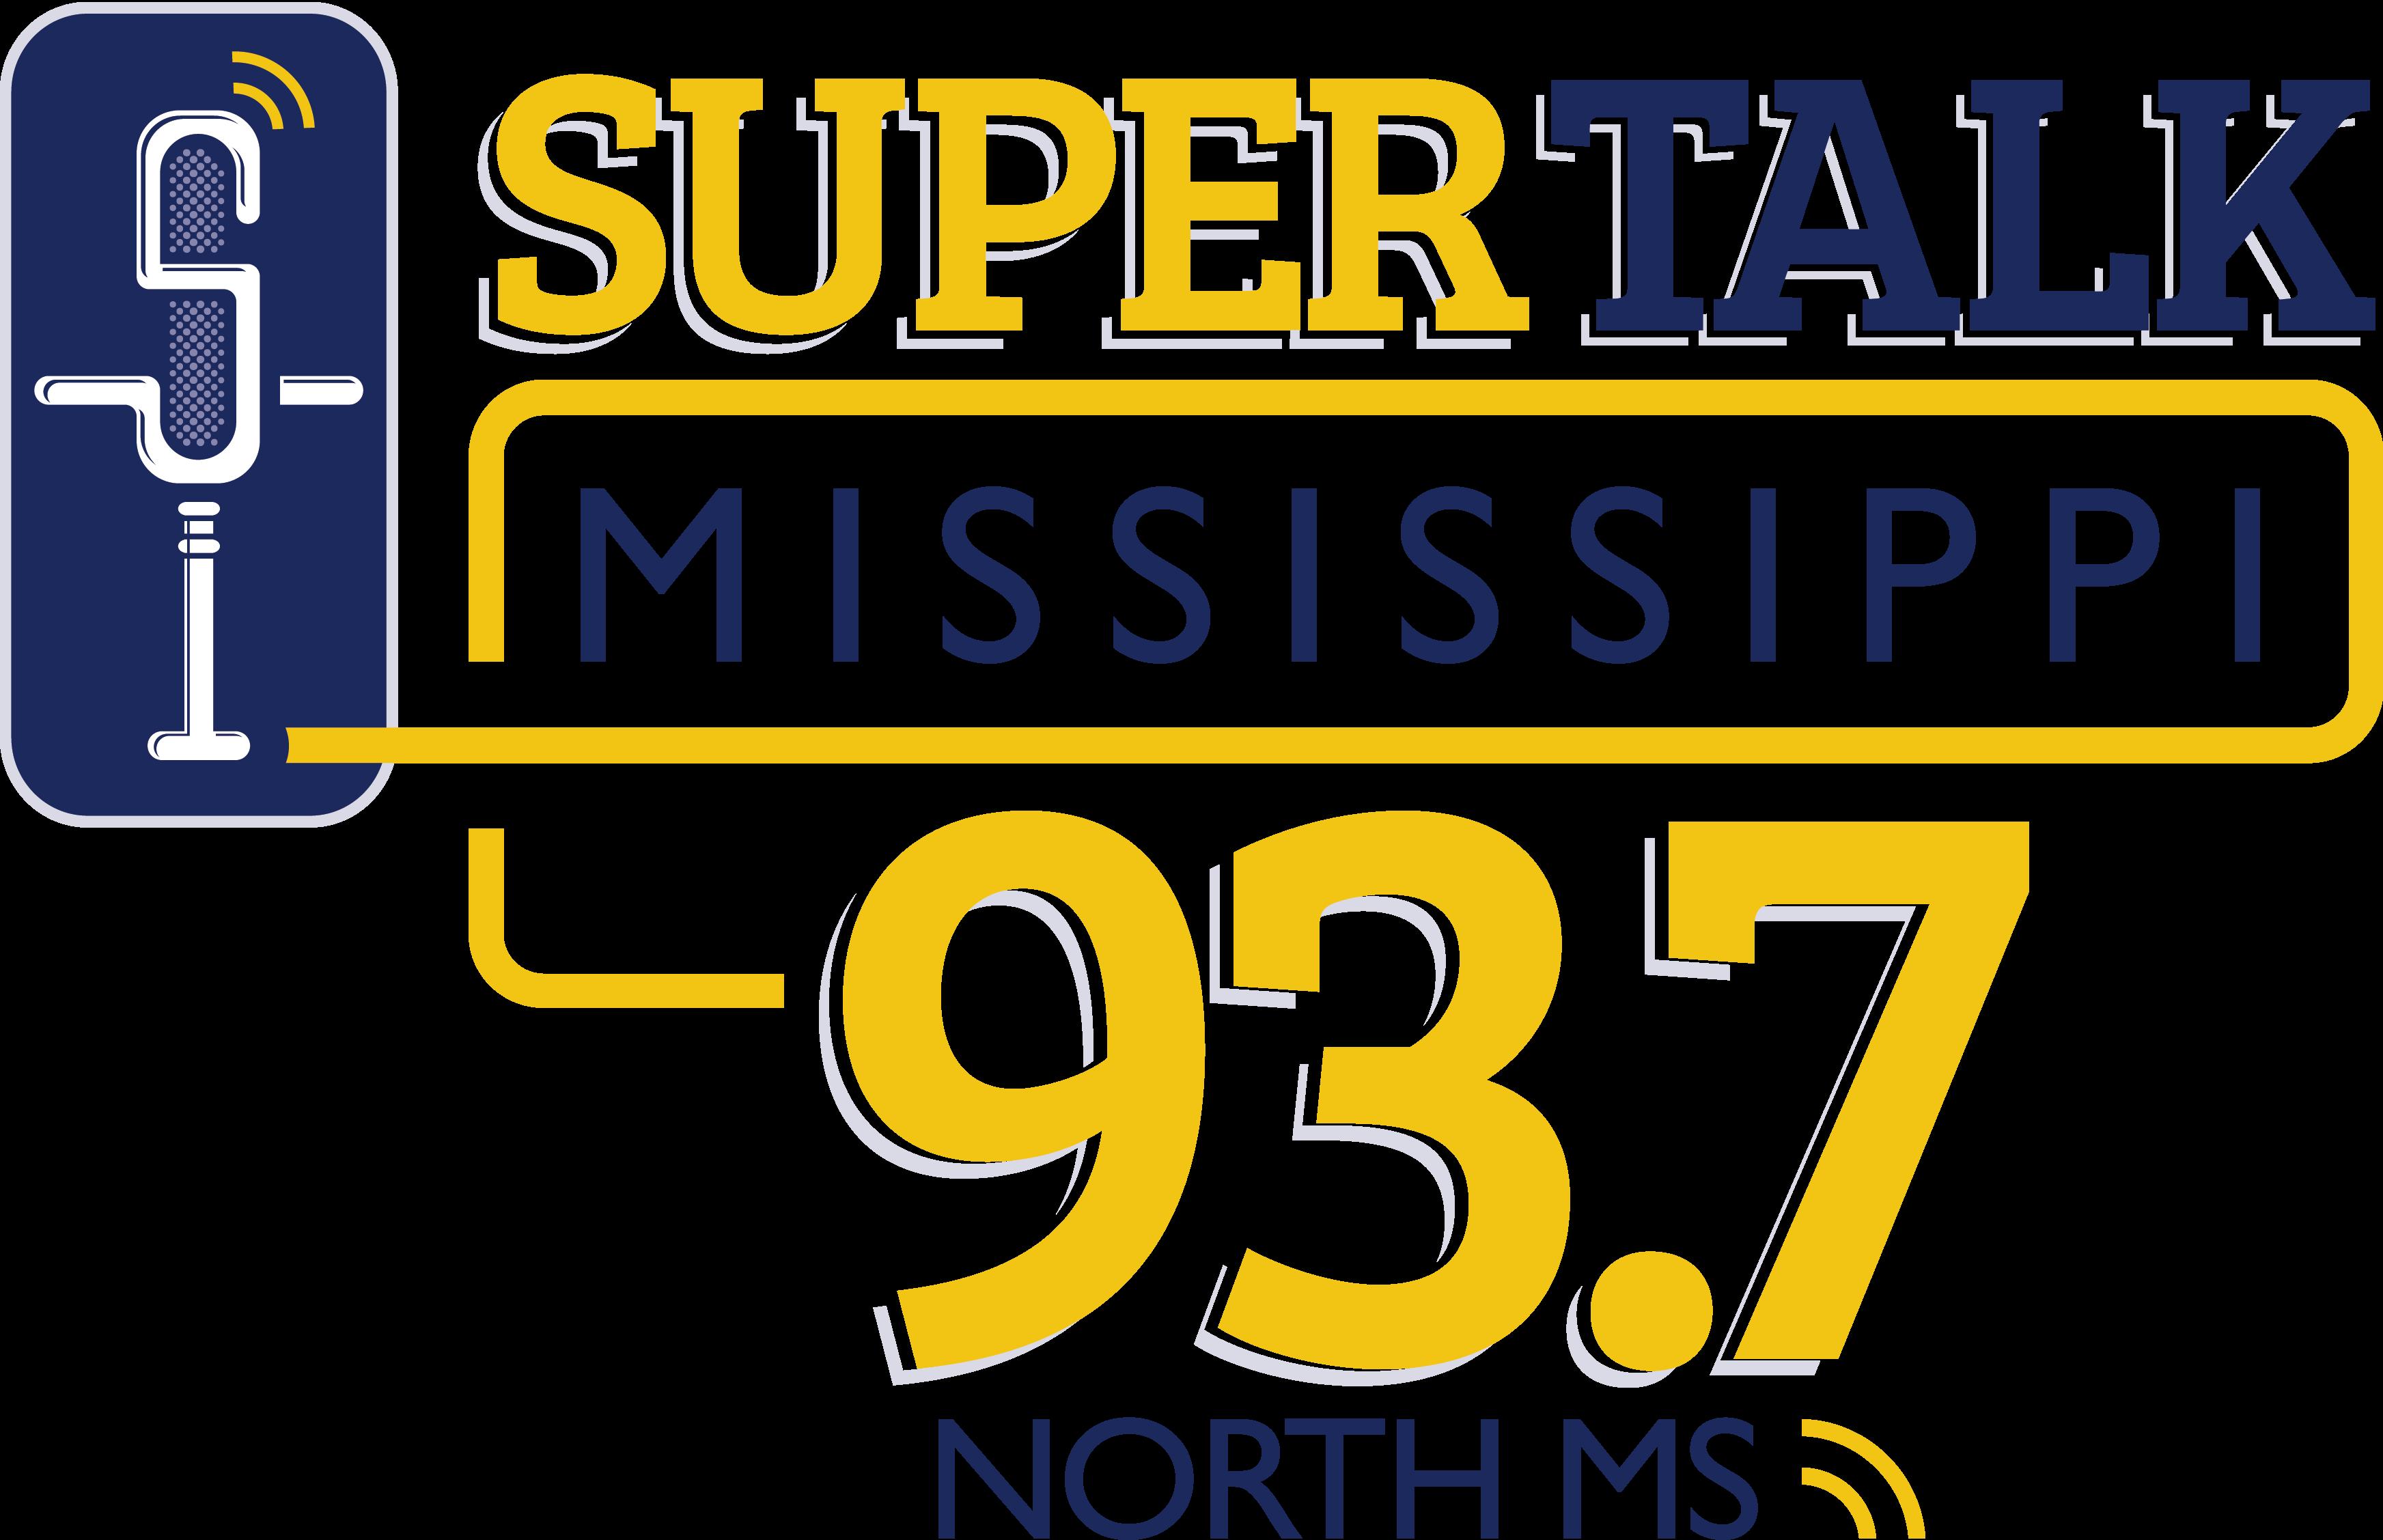 Super Talk 93.7